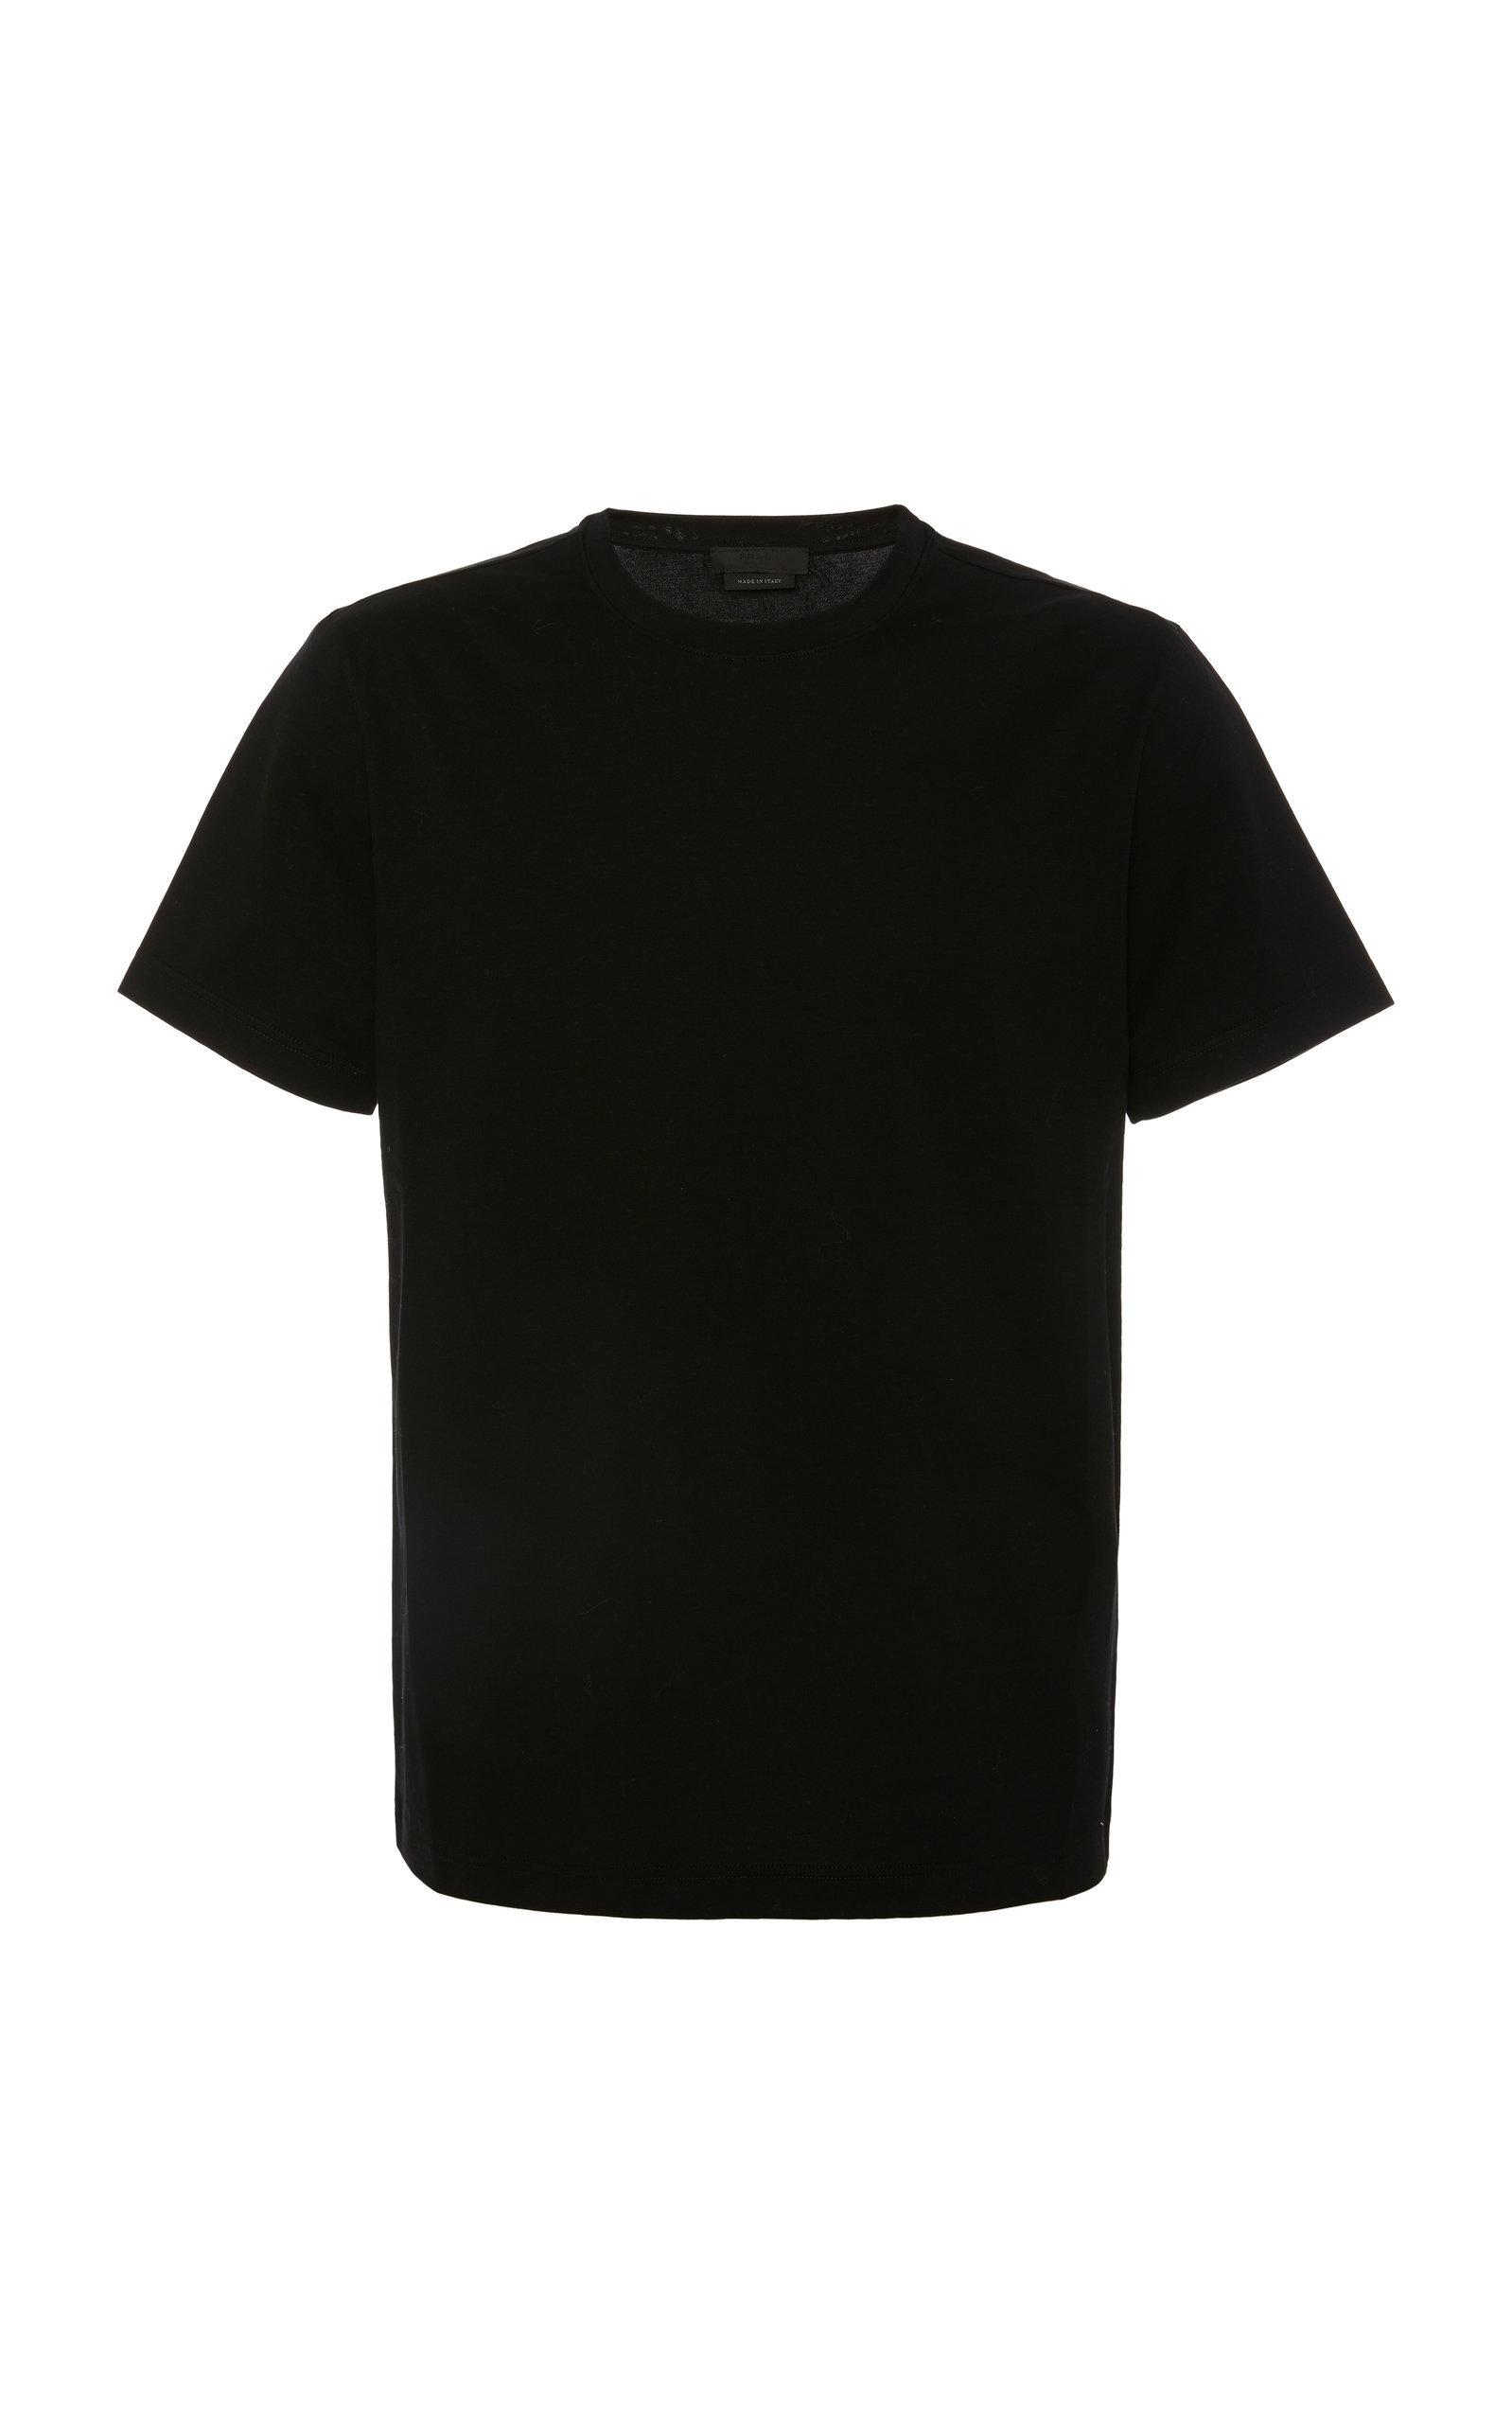 Prada Set Of Three Cotton-jersey T-shirts In Black